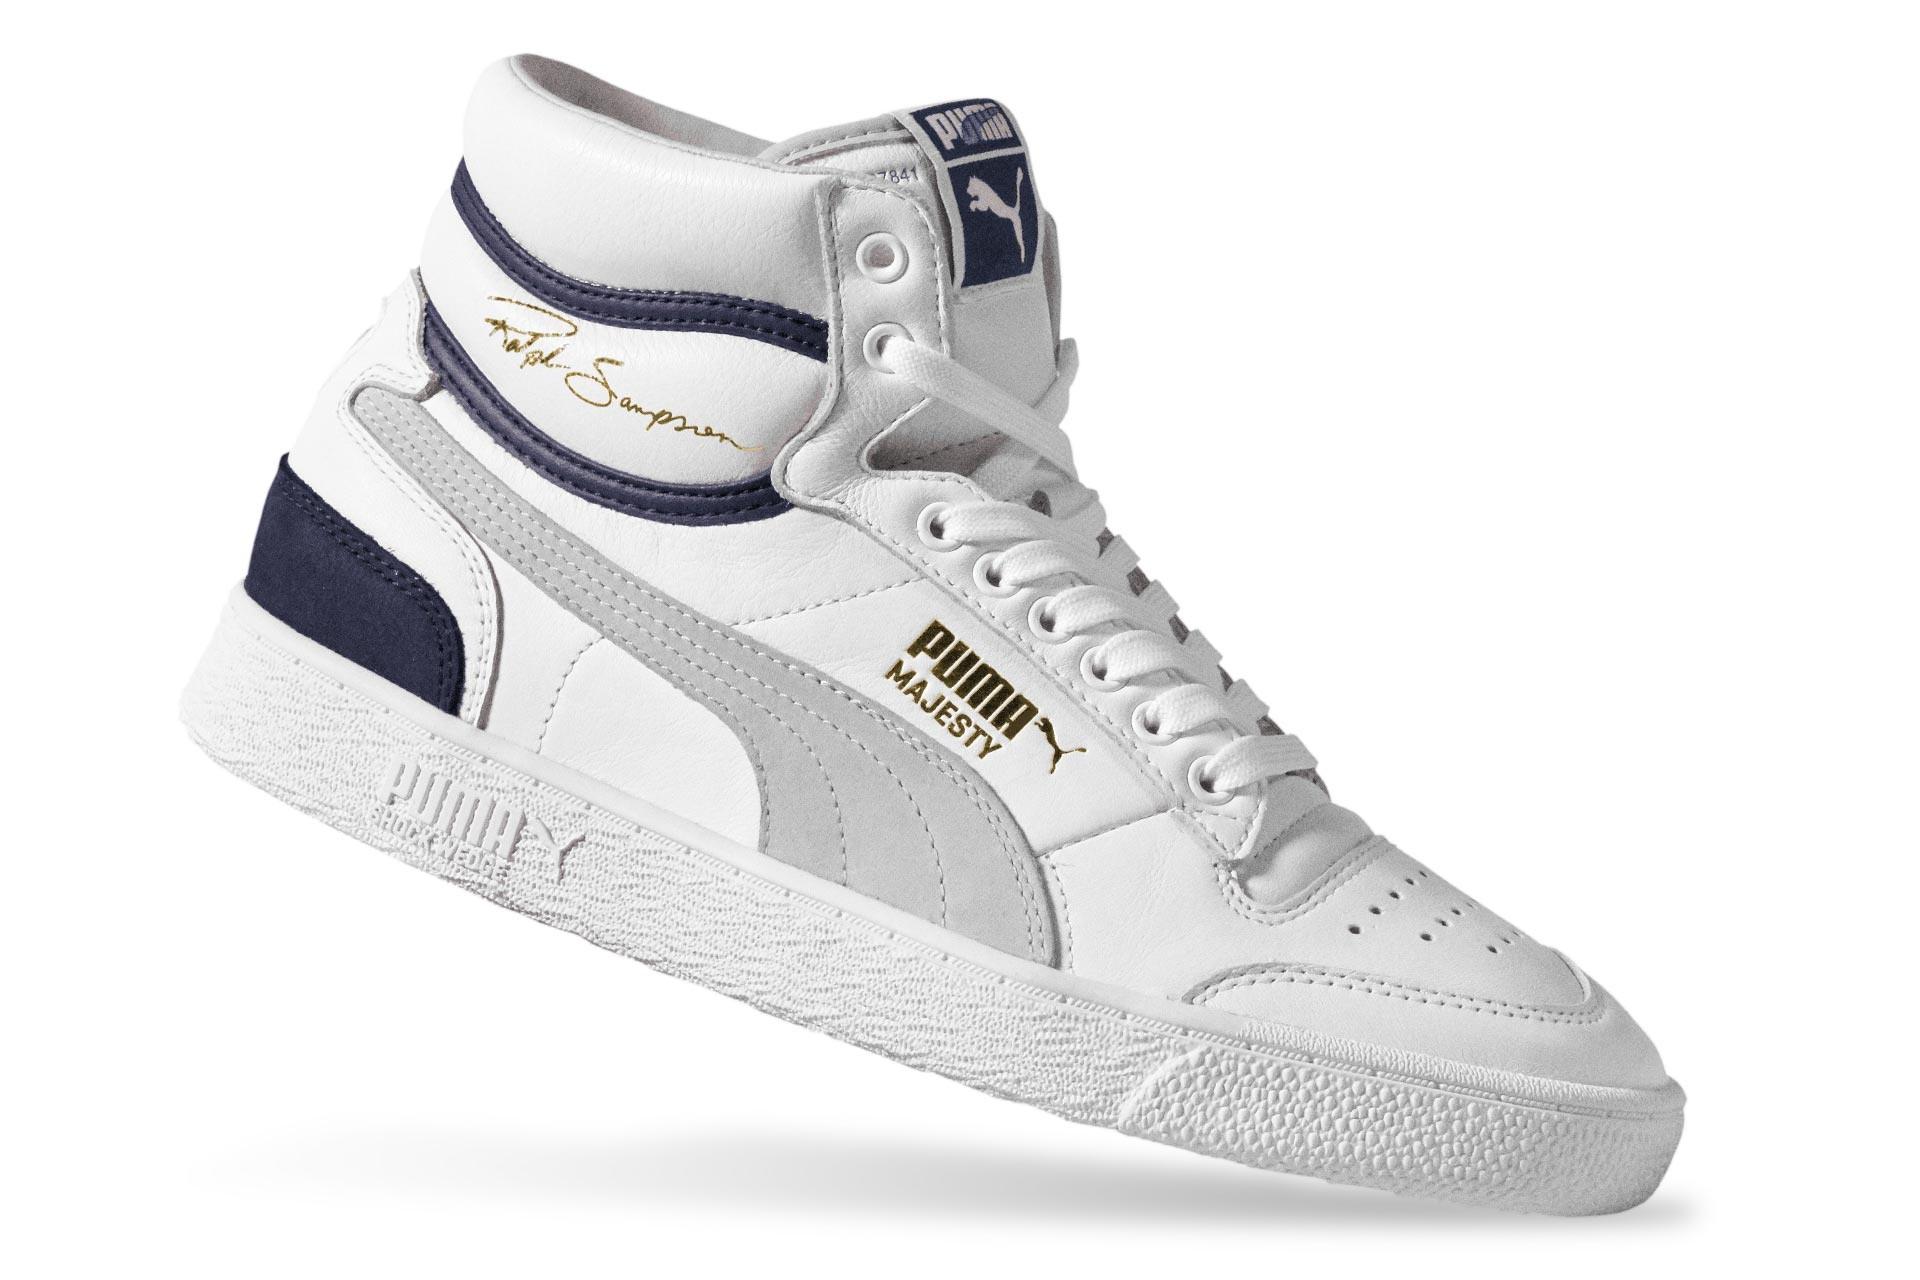 Foto van Puma Ralph Sampson Mid Og 370718 01 Sneakers Puma White-Gray Violet-Peacoat April